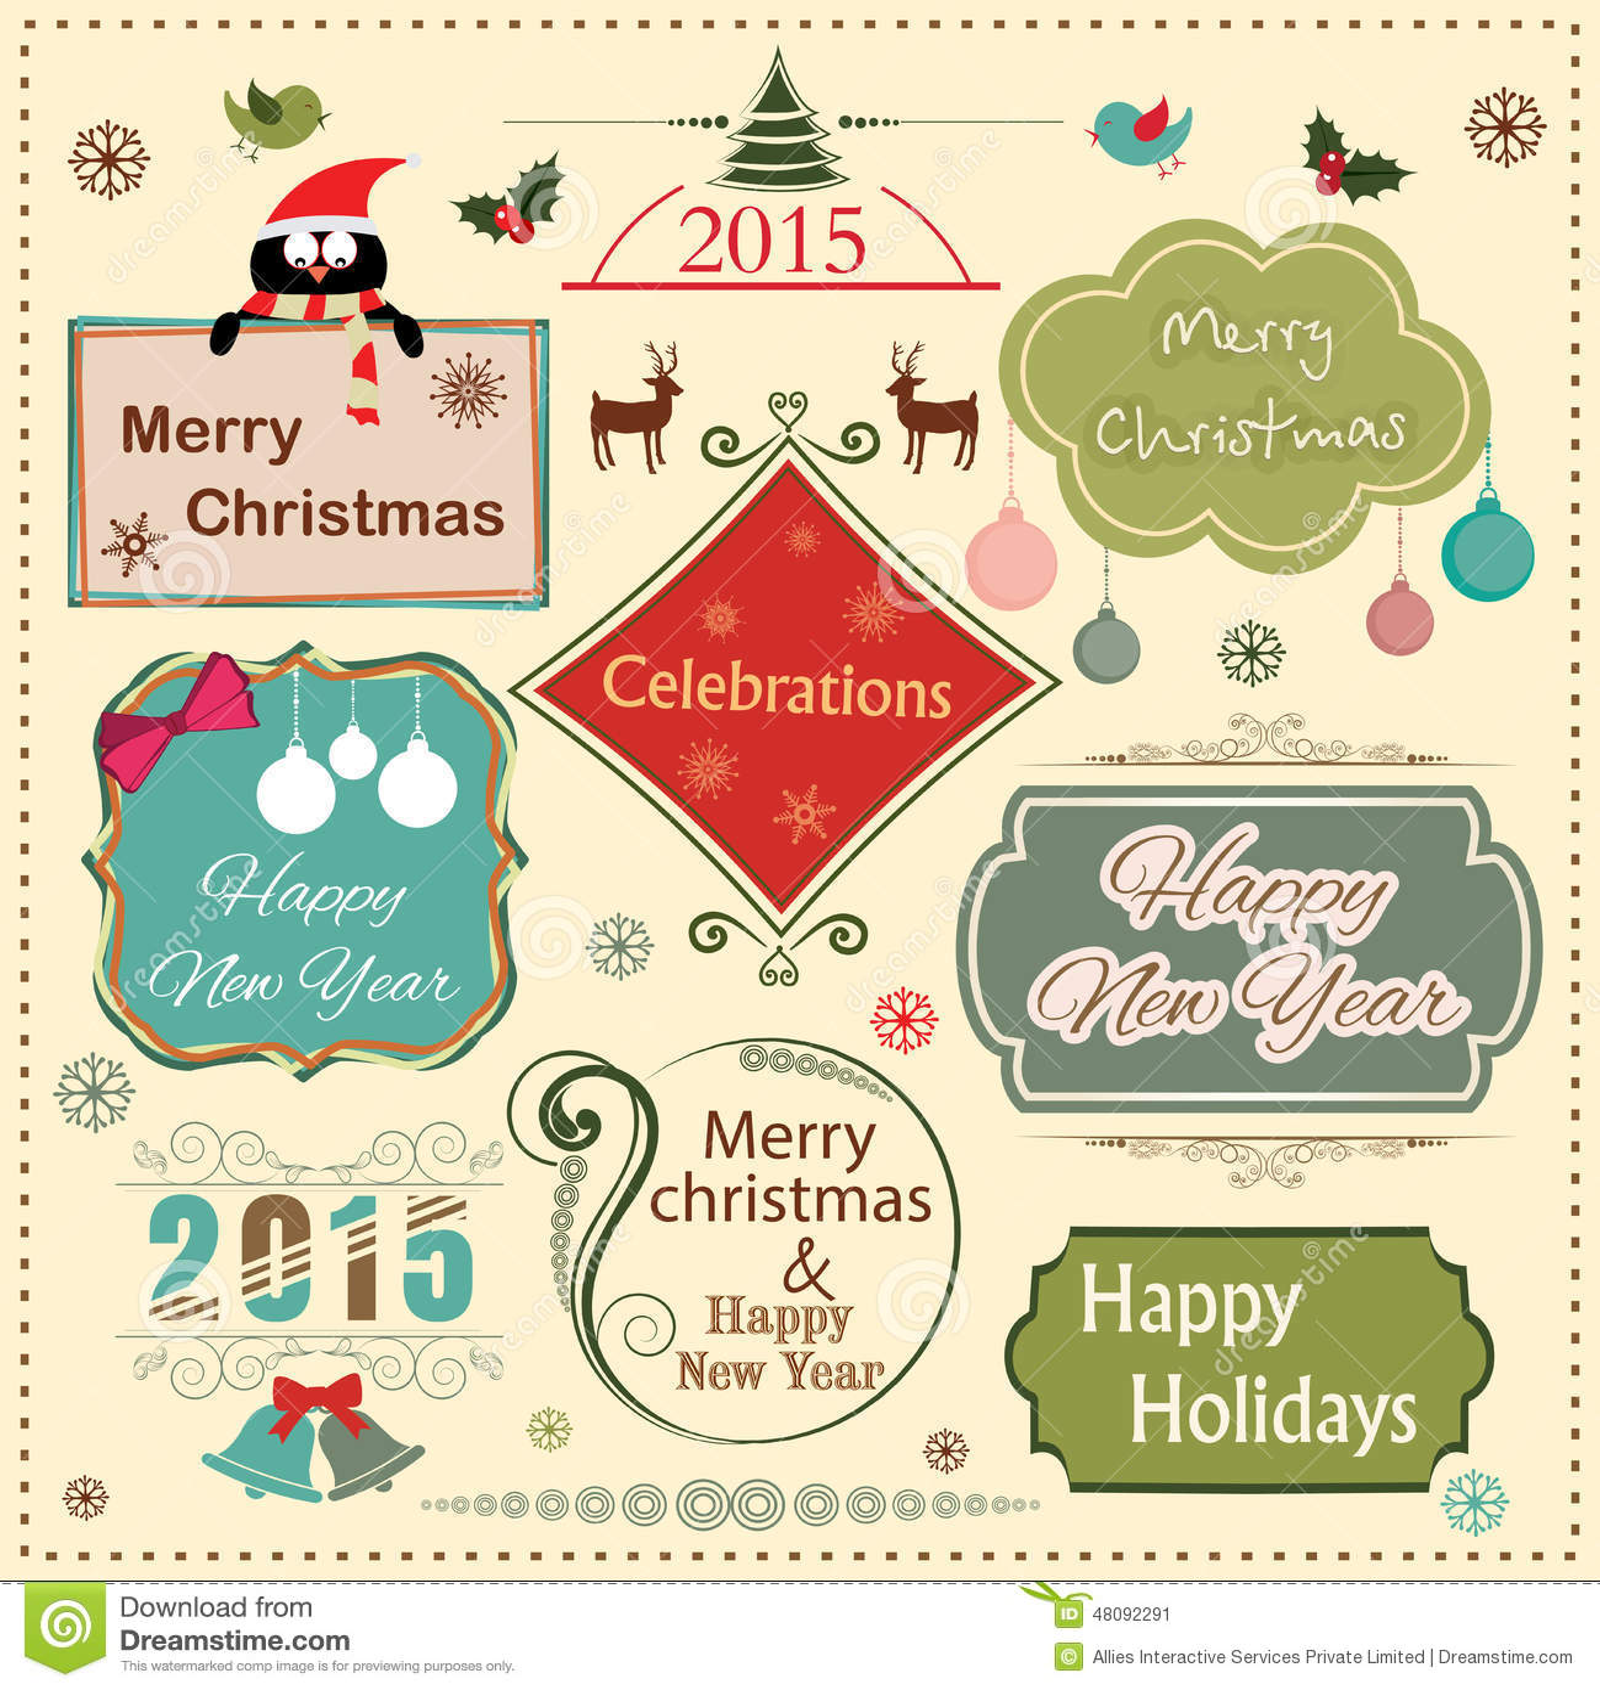 Brc Holiday Celebration Photos 2015: Happy New Year 2015 And Merry Christmas Celebration